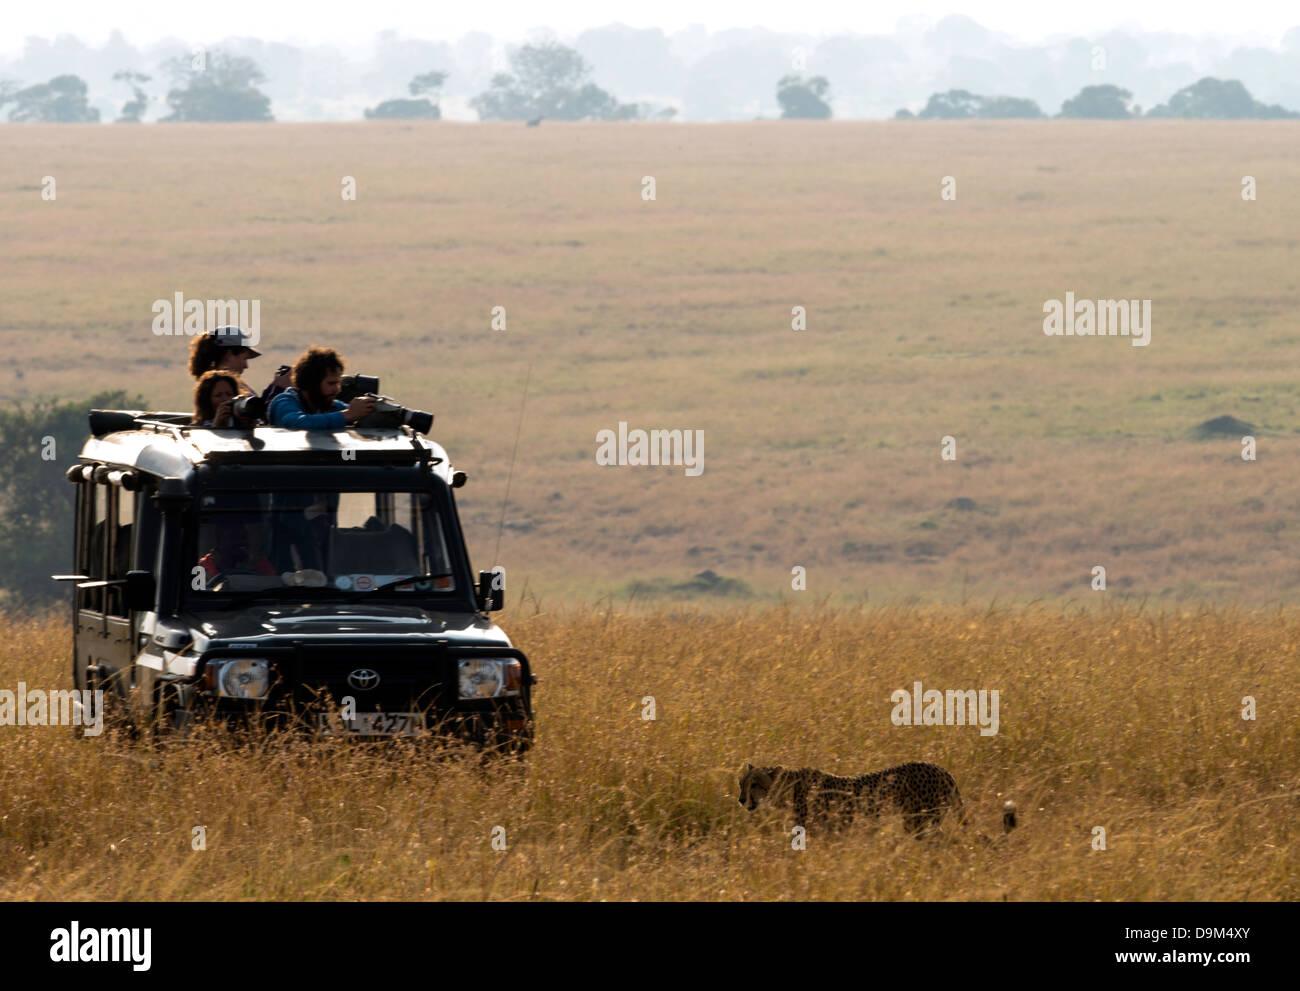 Voiture jeep safari photo Kenya Kicheche Afrique Masai Mara Photo Stock